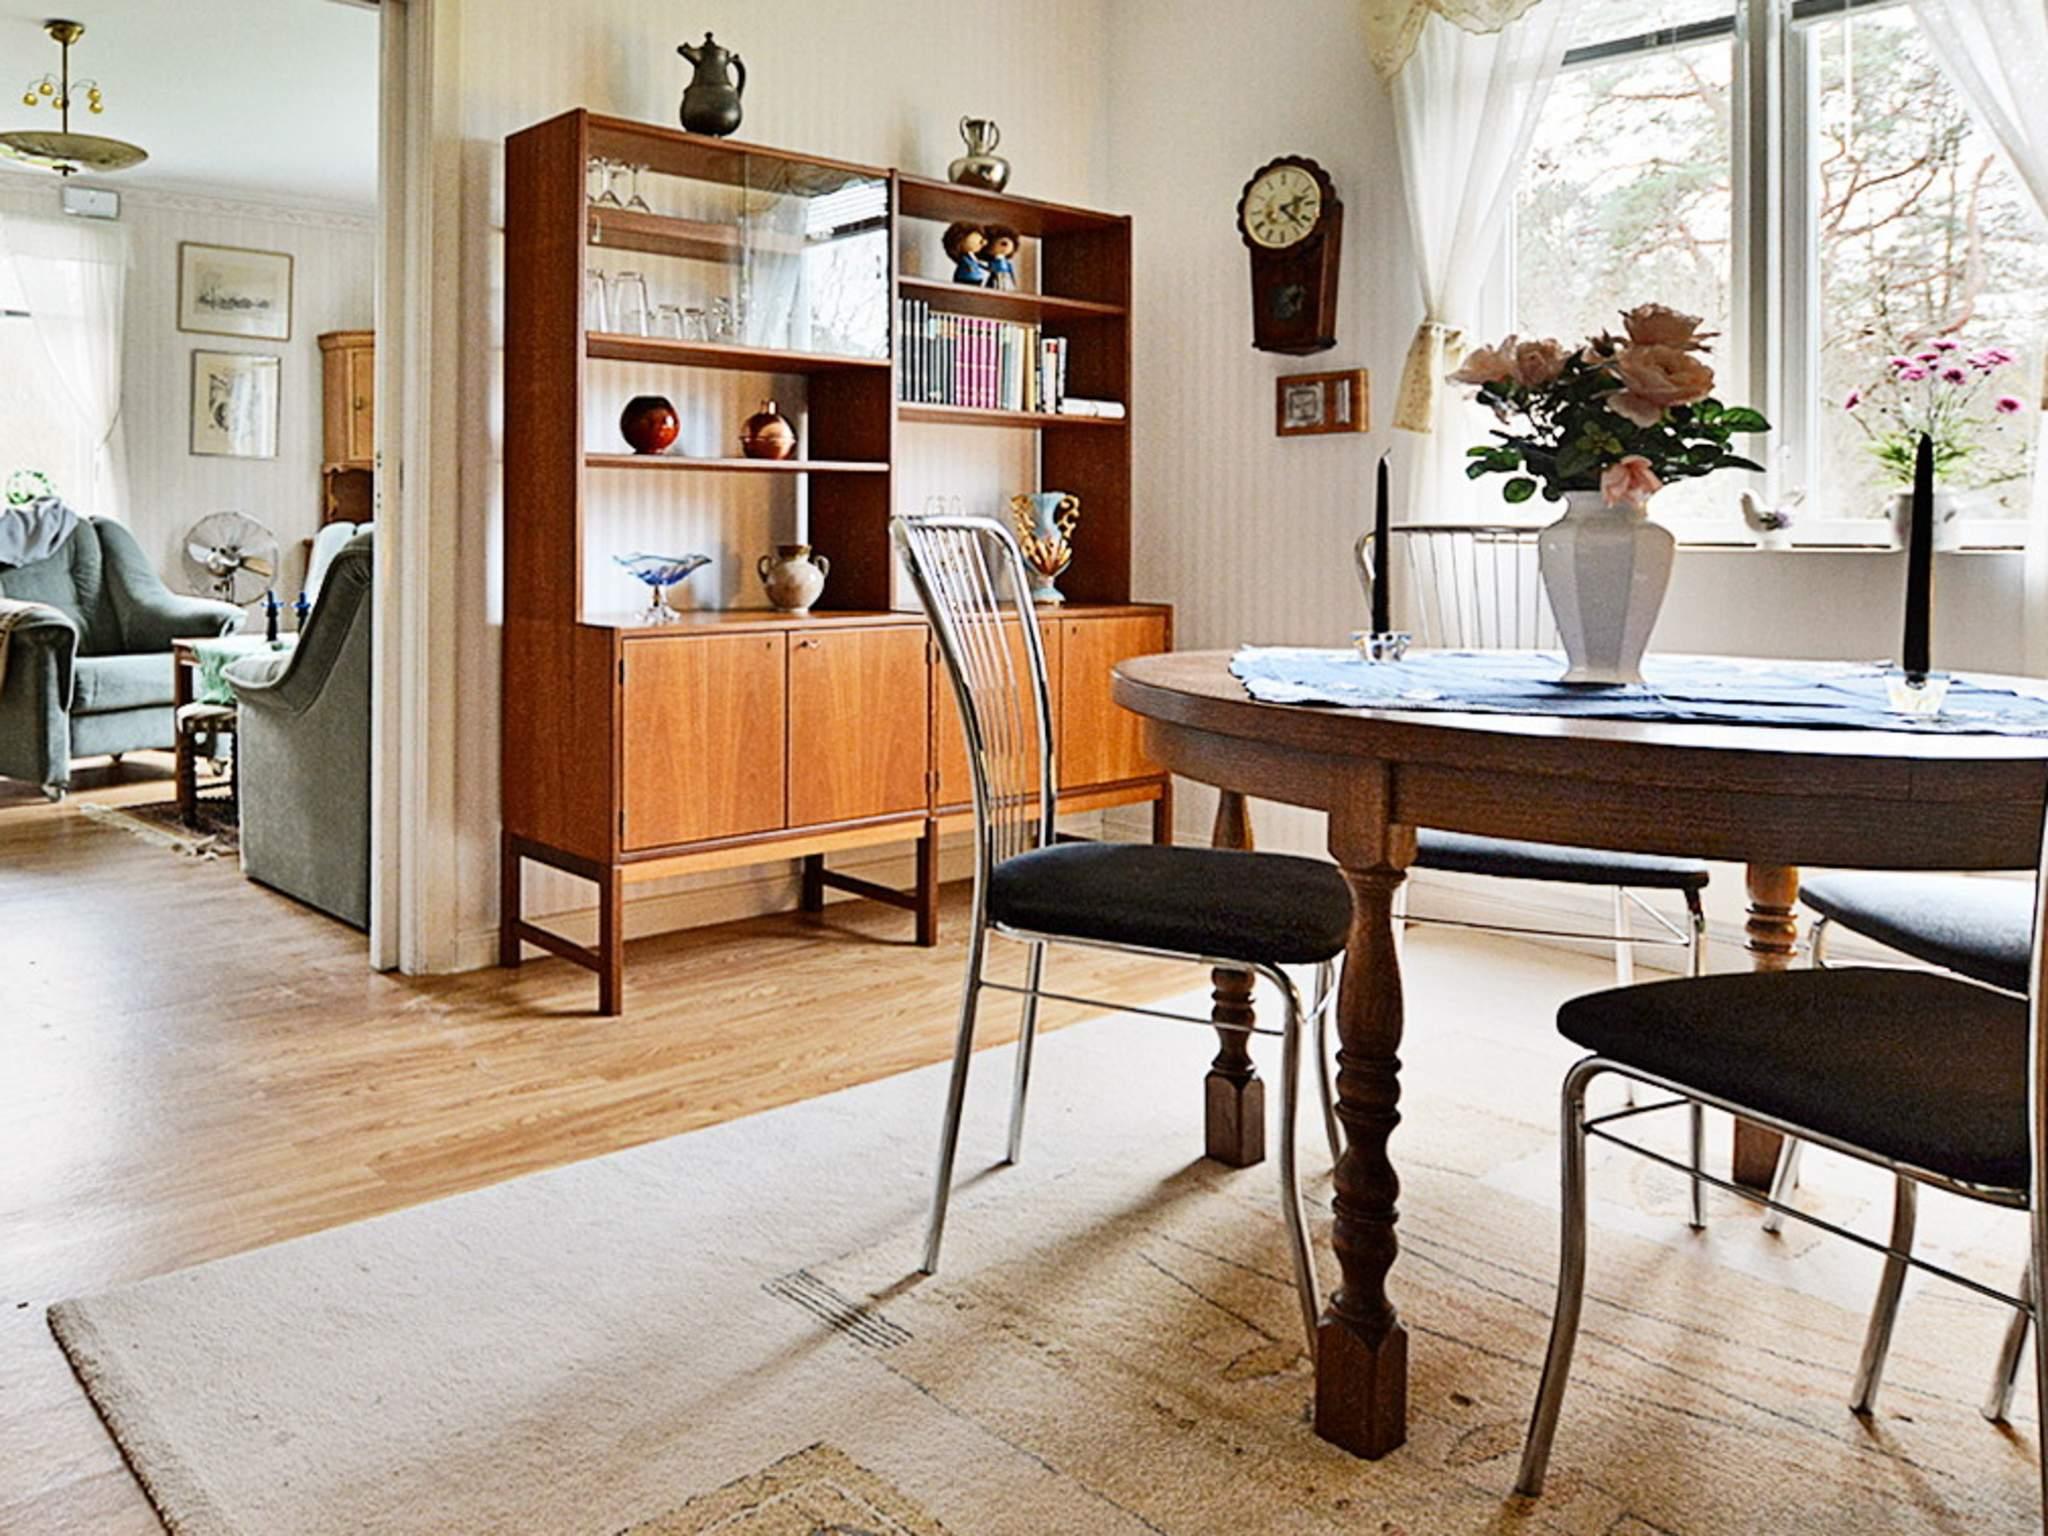 Ferienhaus Sandsjöfors (418764), Sandsjöfors, Jönköpings län, Südschweden, Schweden, Bild 4